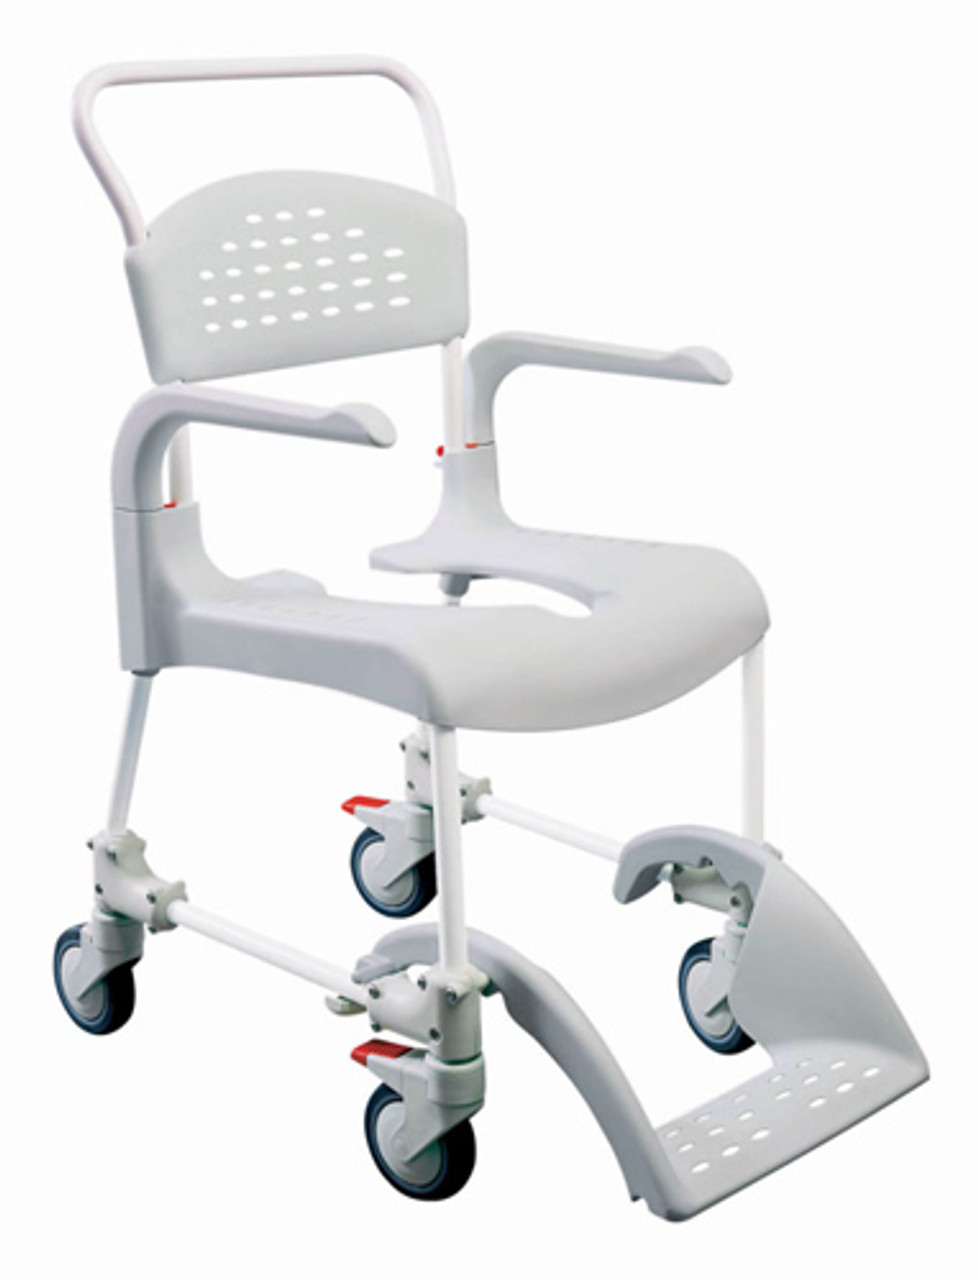 Miraculous Etac Clean Shower Chair Download Free Architecture Designs Scobabritishbridgeorg